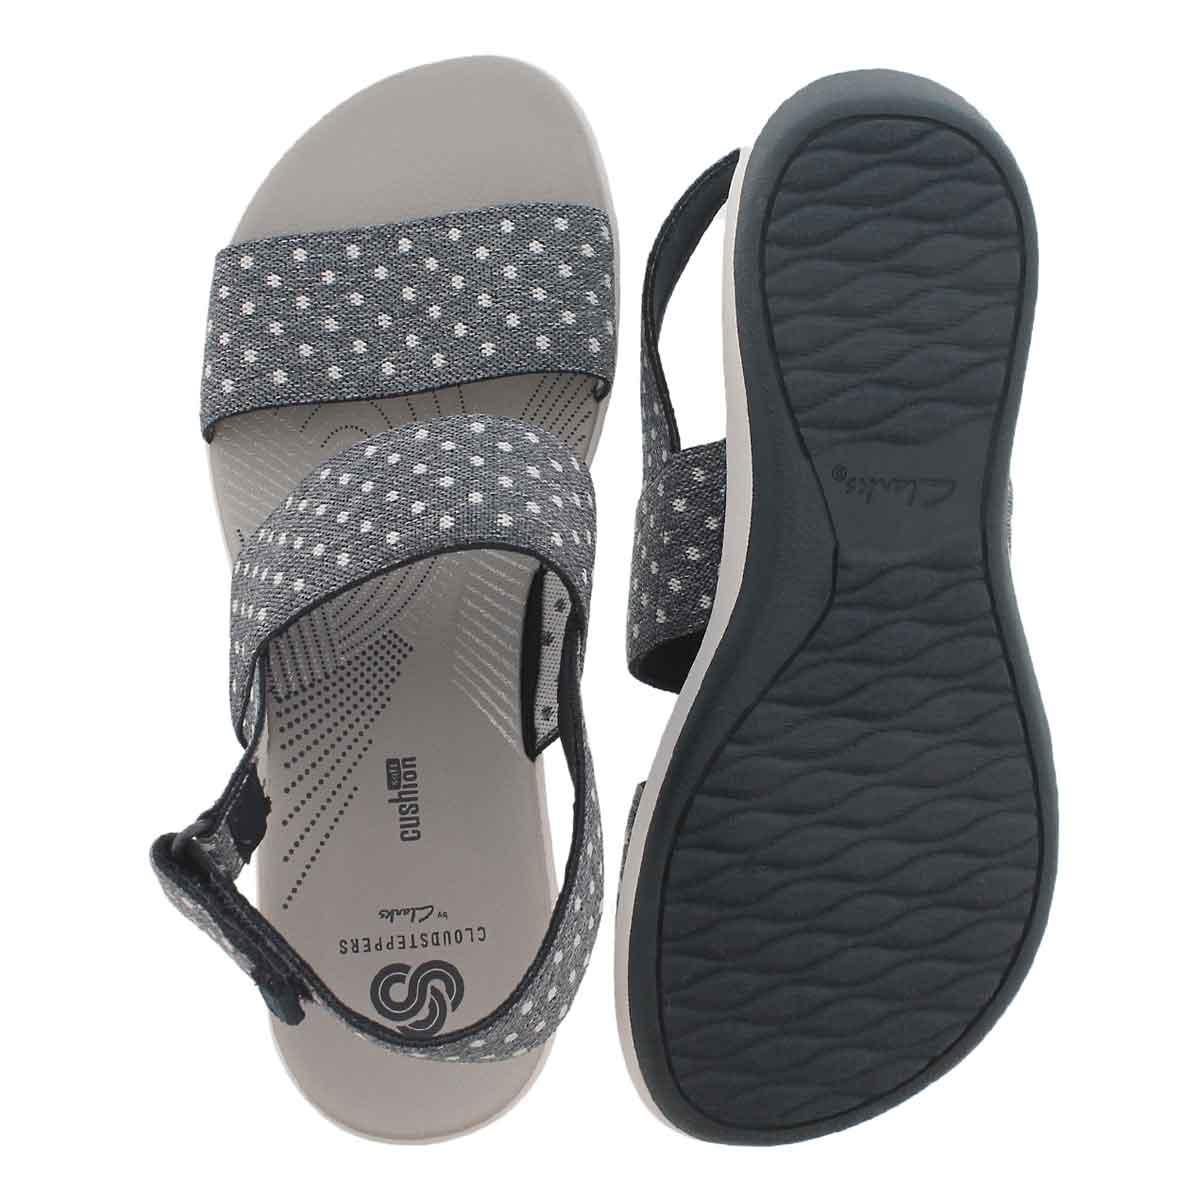 Lds Arla Jacory nvy/wht dot wedge sandal